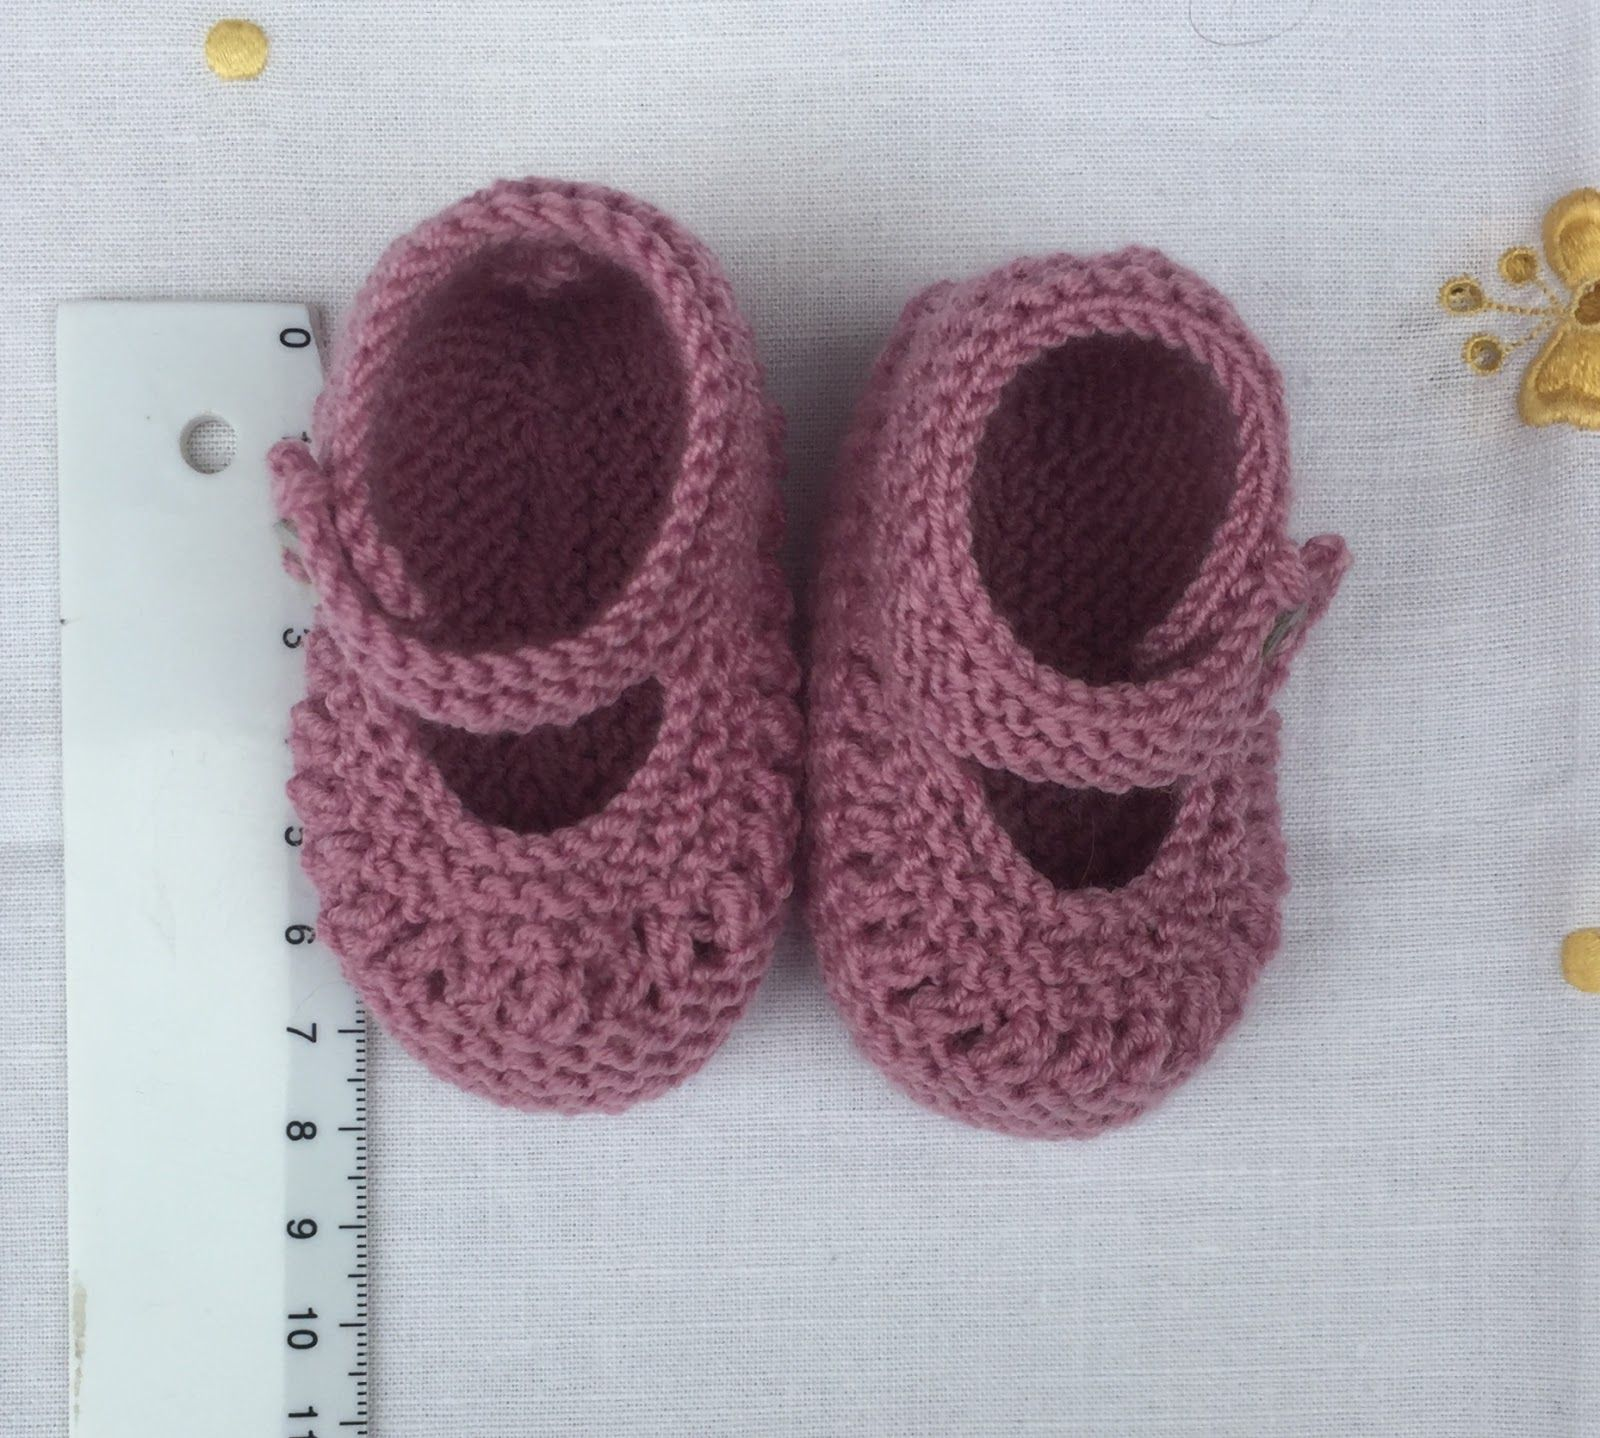 8734239e2 SANDALIAS COLOR MALVA DE LANA PARA PRIMERA POSTURA Materiales Lana especial  bebé marca DROPS